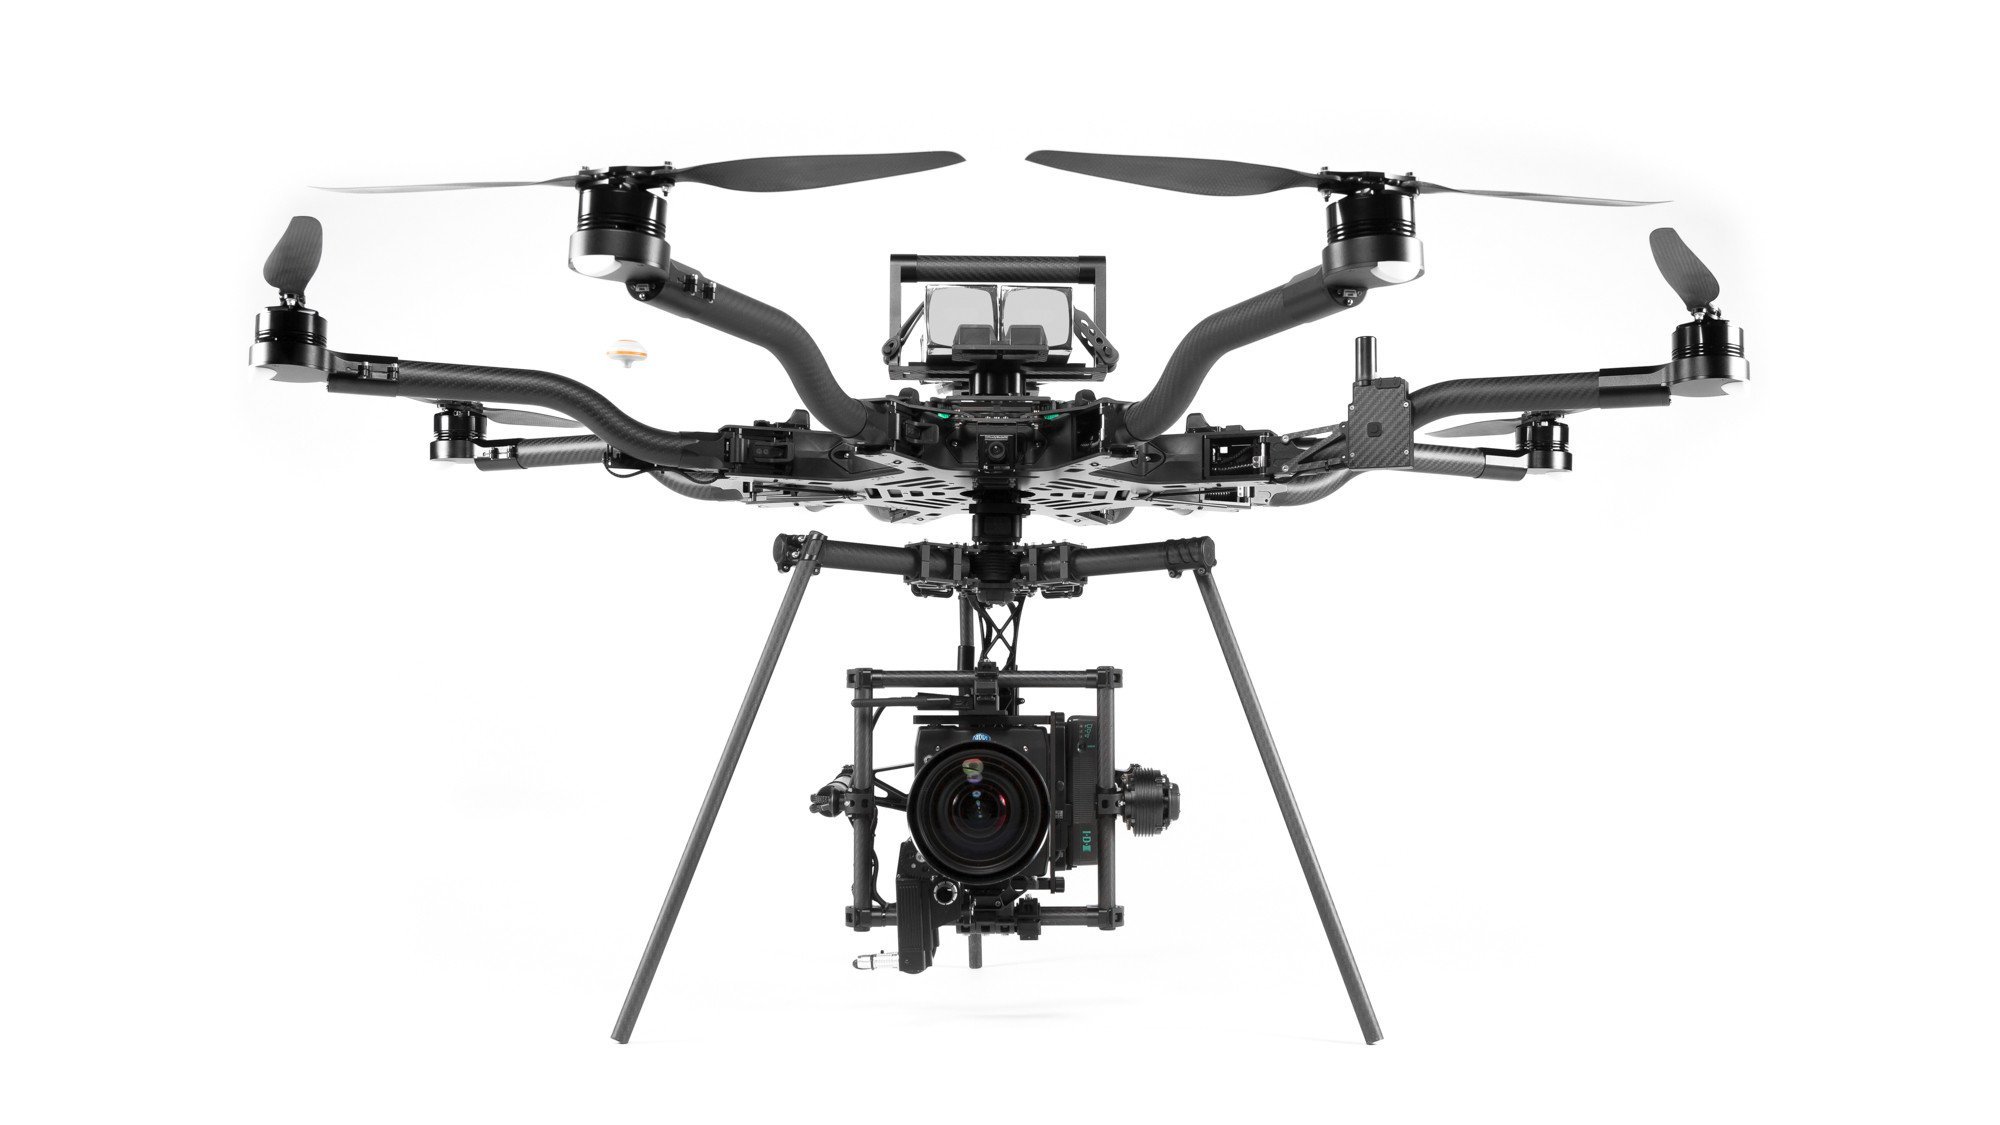 Top Ten Drones For Industry Use